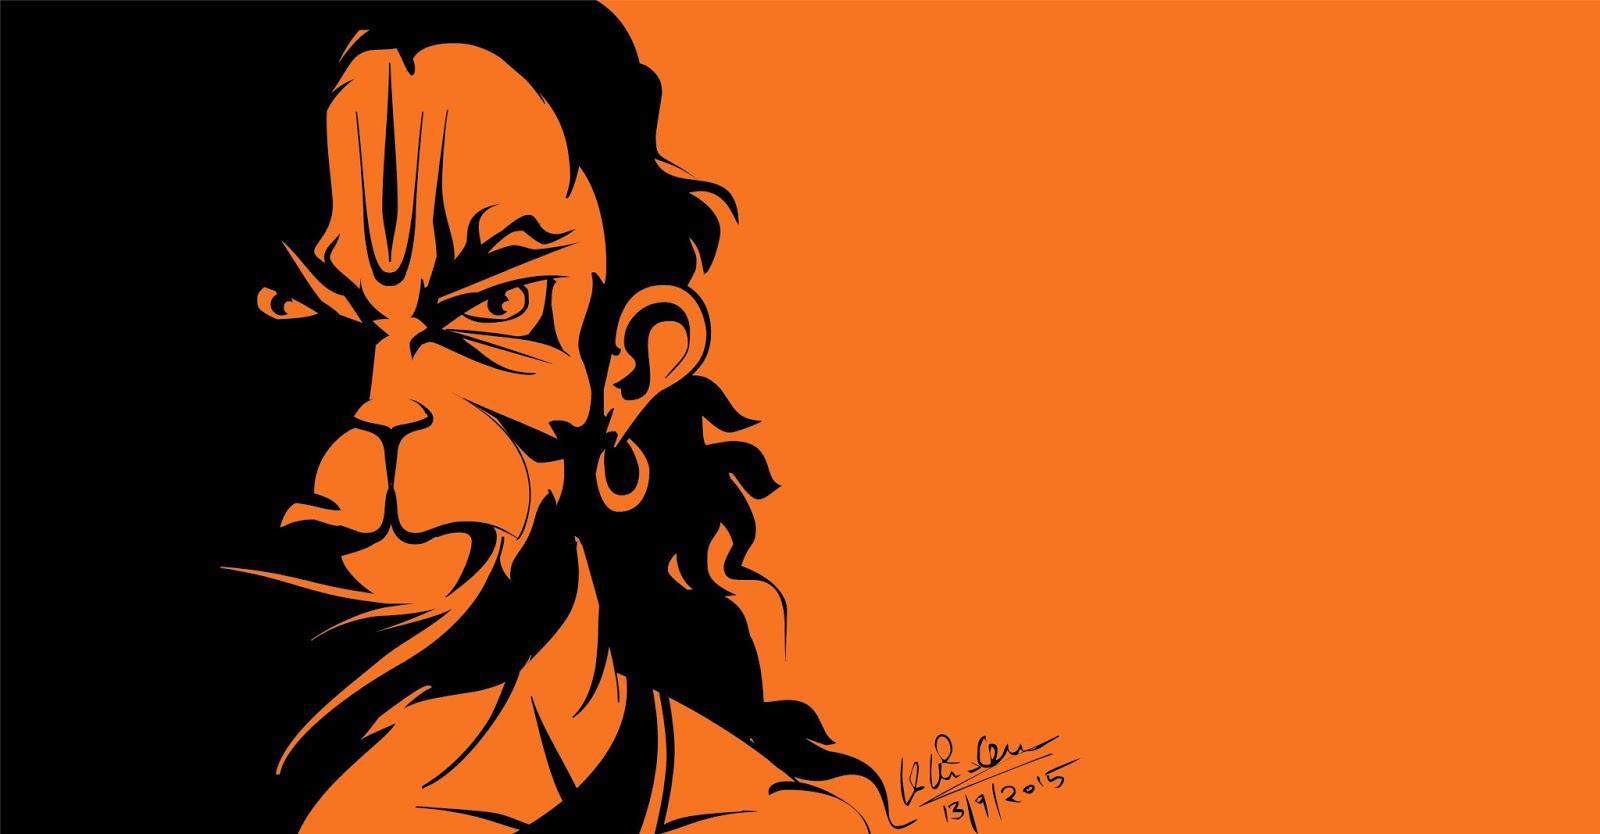 Biography of Chhatrapati Shivaji Maharaj (Shivaji Raje